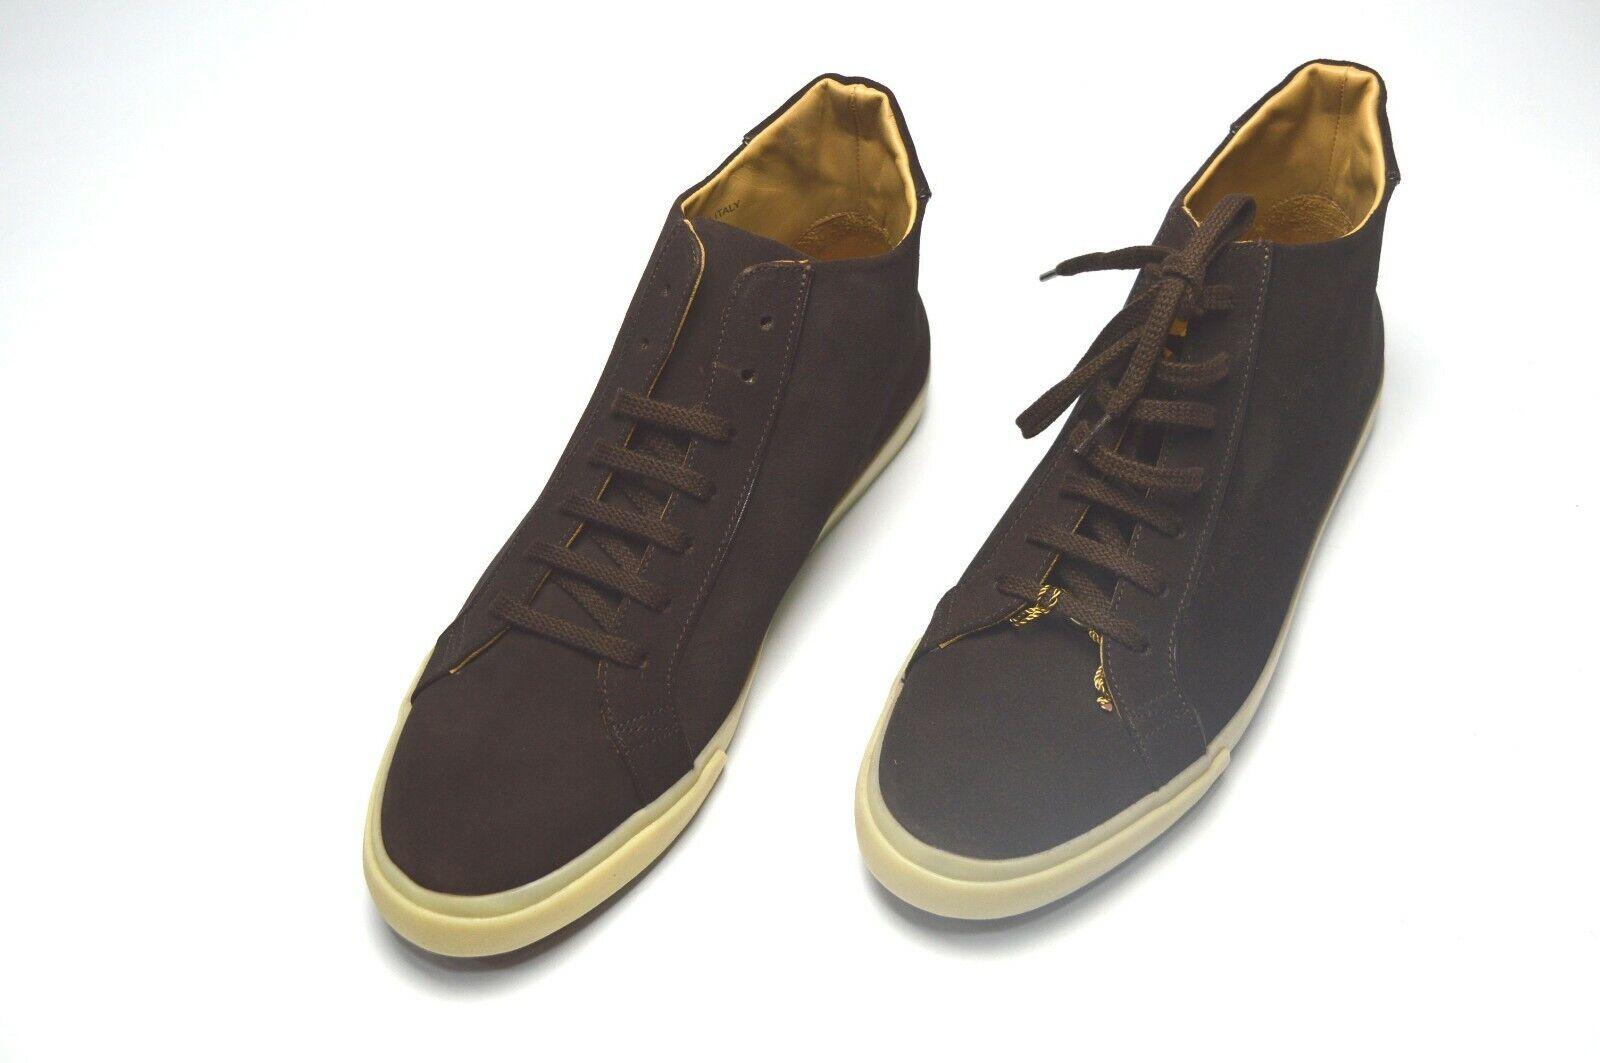 NEW Loro PIANA  Freetime Walk stivali Imperfect scarpe Sz Eu 45 Uk 11 Us 12 (LP1)